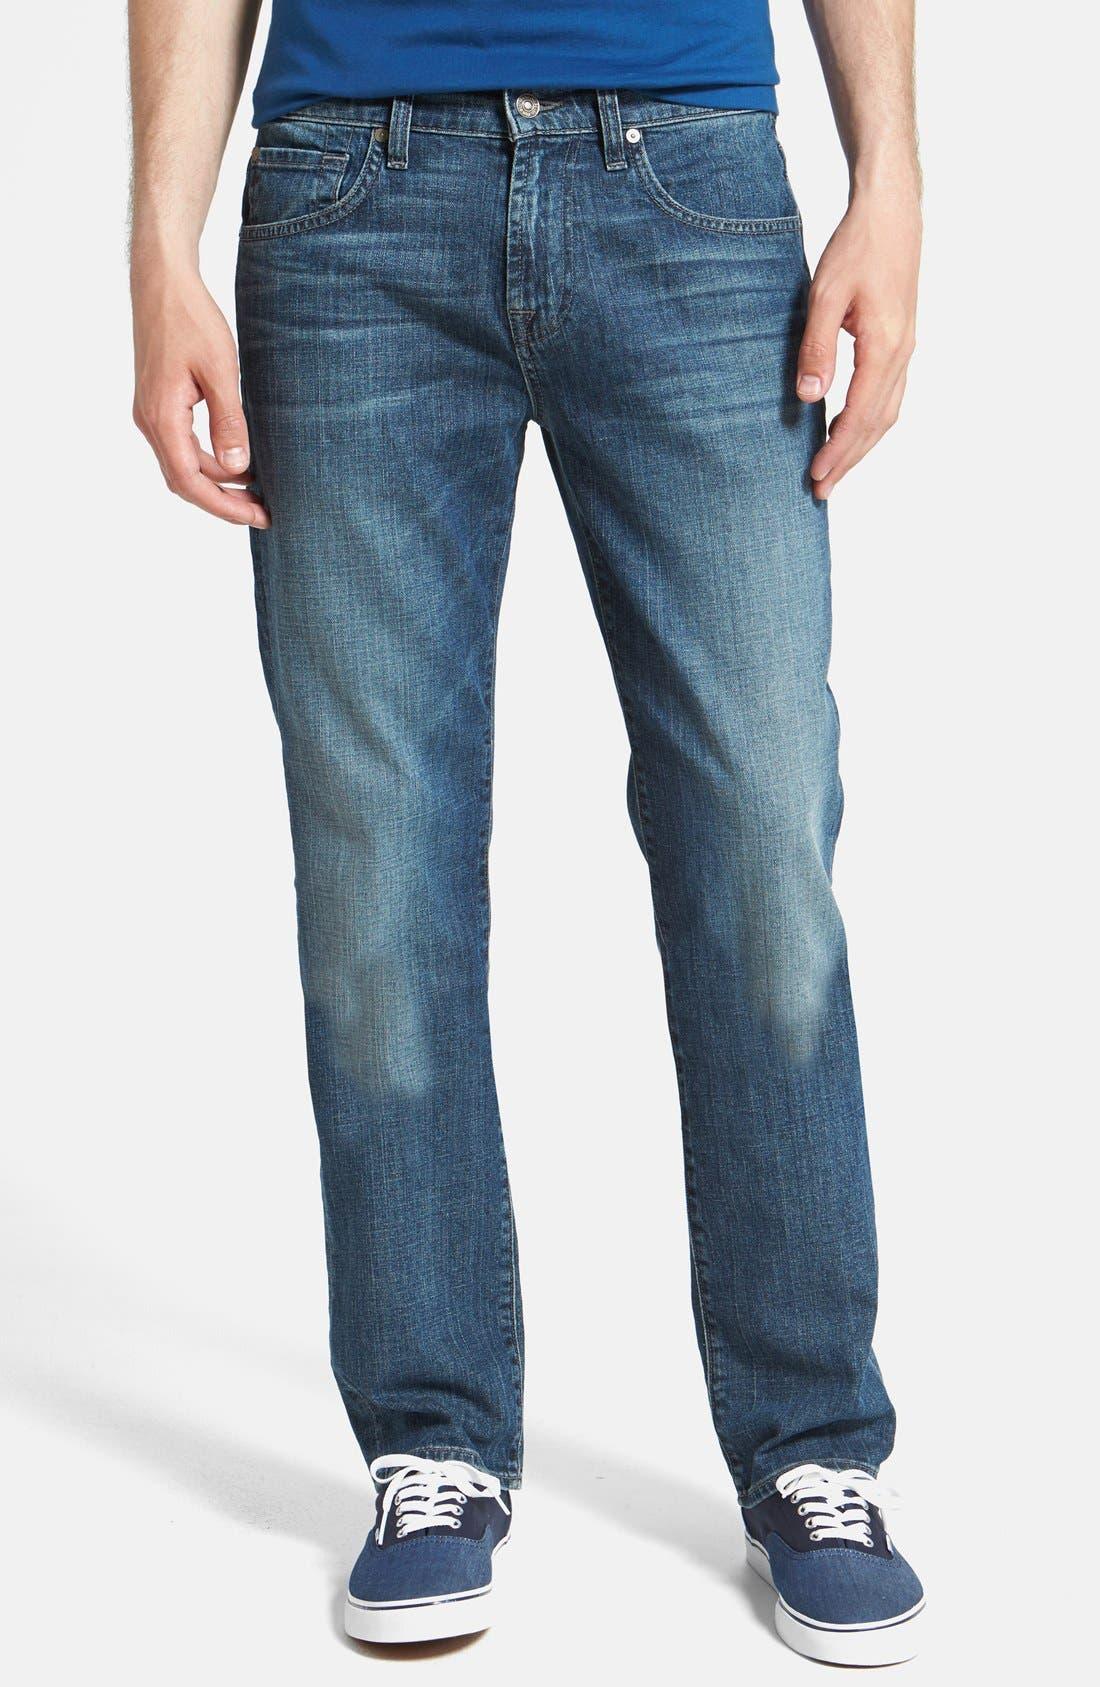 Alternate Image 1 Selected - 7 For All Mankind® 'The Straight' Modern Straight Leg Jeans (Blueridge)